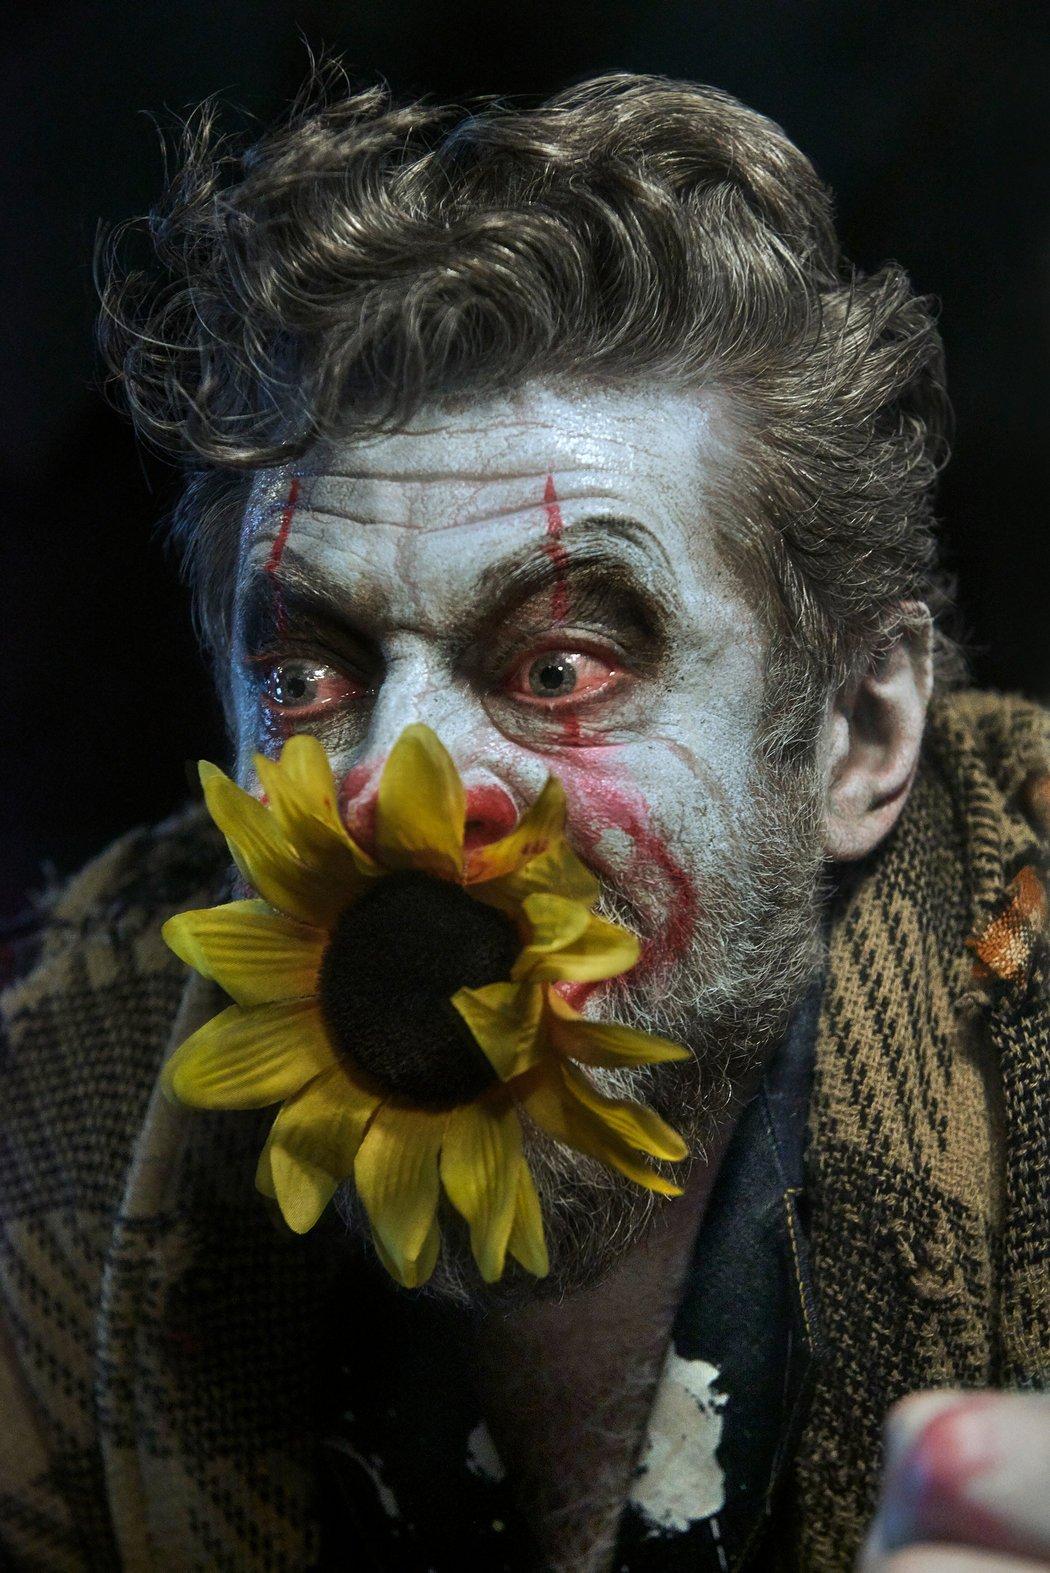 Голливудские звезды снялись в хоррор-проекте The New York Times-Фото 4